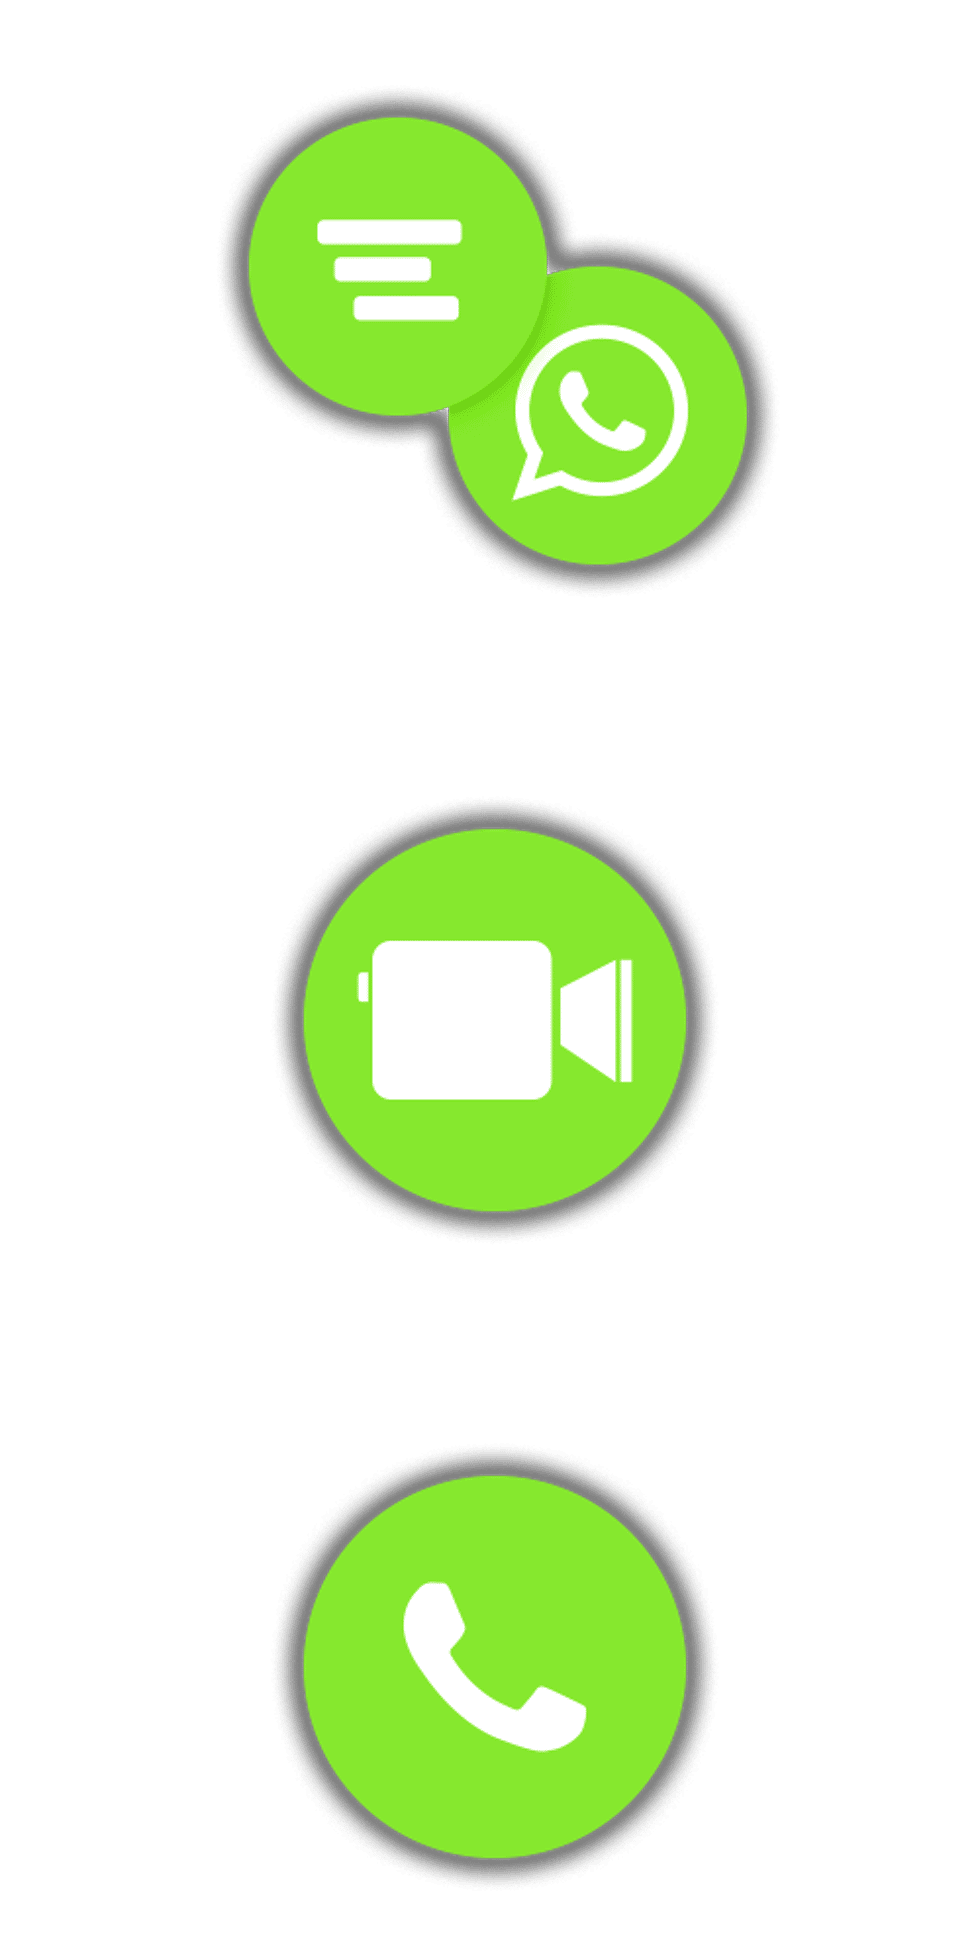 HKAutolease contact logo's